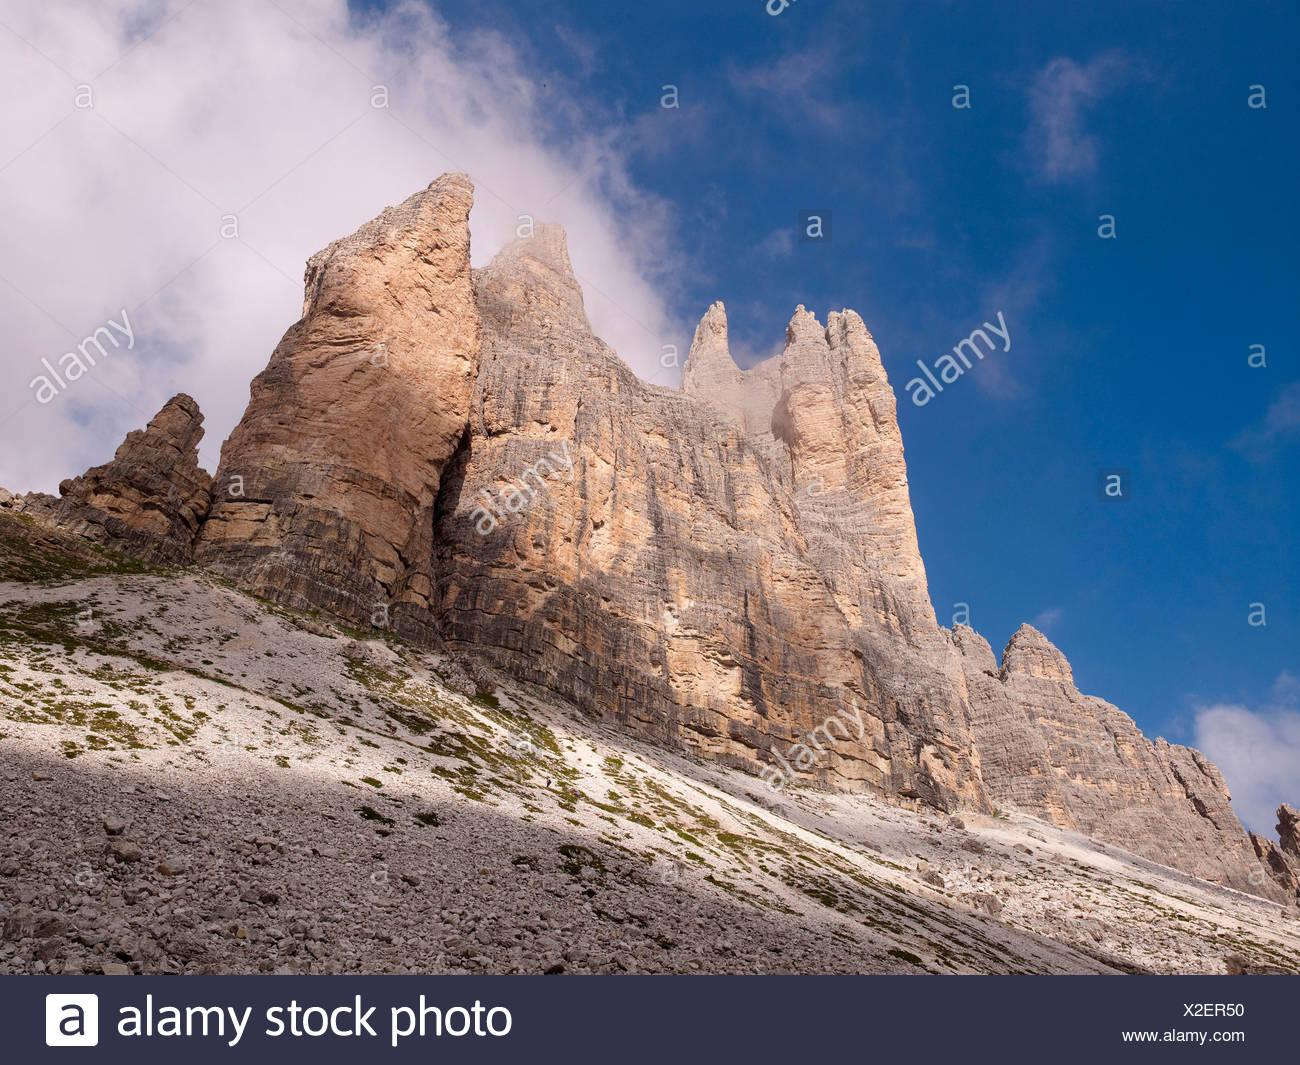 Tre Cime di Lavaredo, Dolomiti di Sesto National Park, Sexten Dolomites, Hochpustertal, High Puster Valley, South Tyrol, Italy - Stock Image